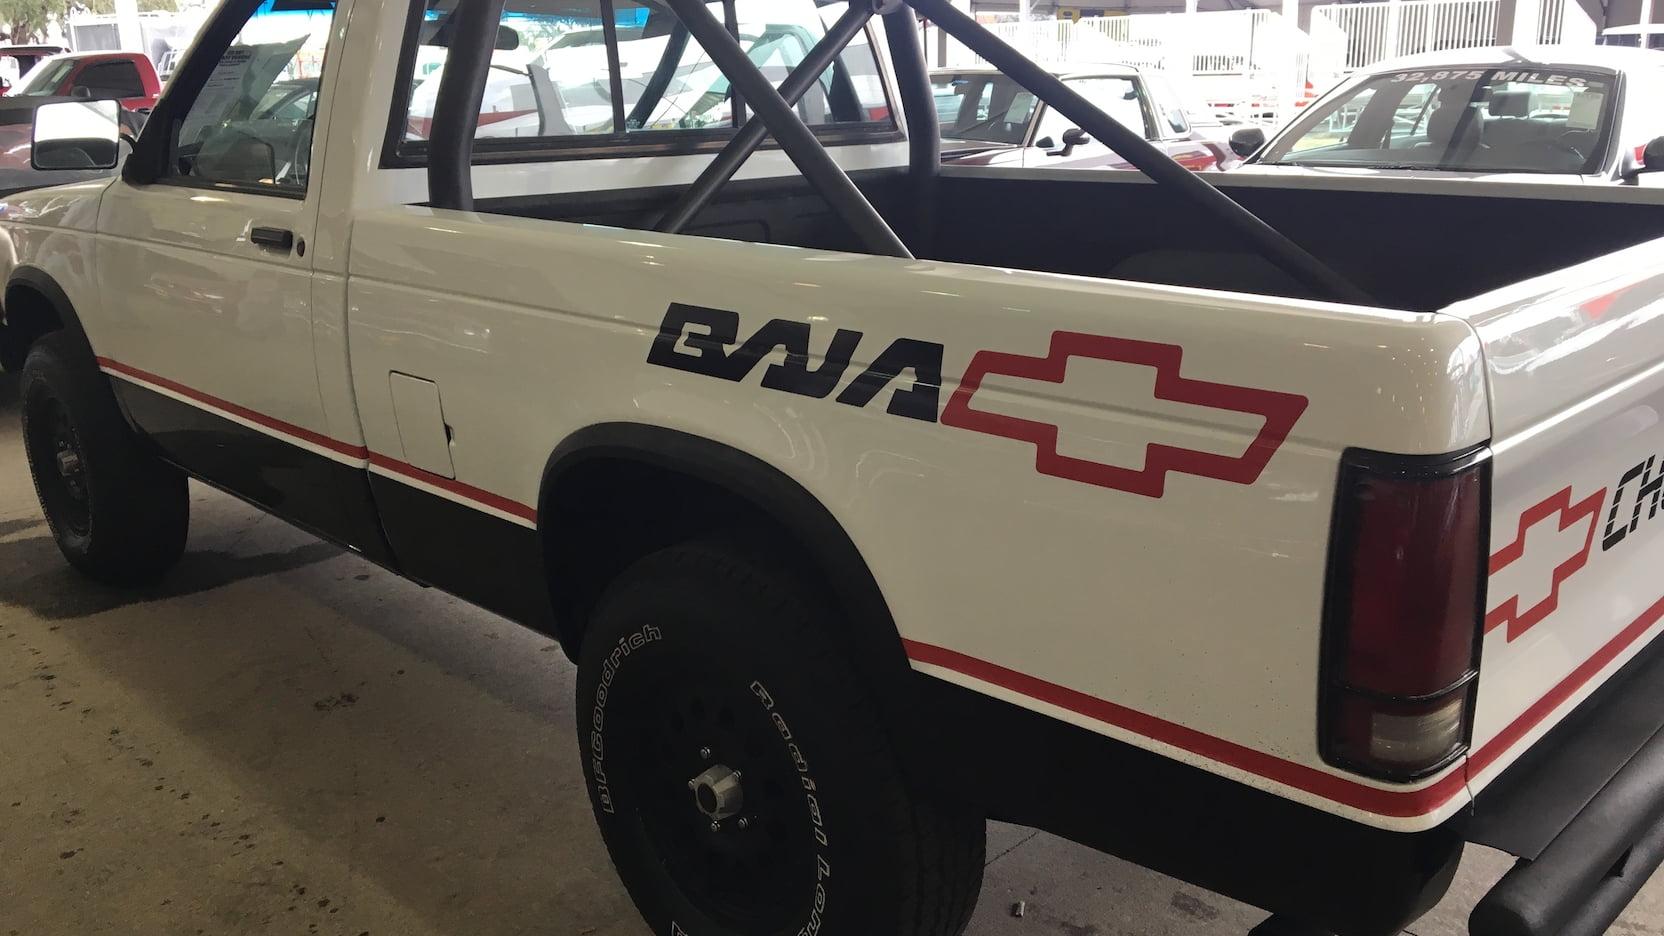 1989 Chevrolet S10 Baja Edition Pickup G56.1 Kissimmee